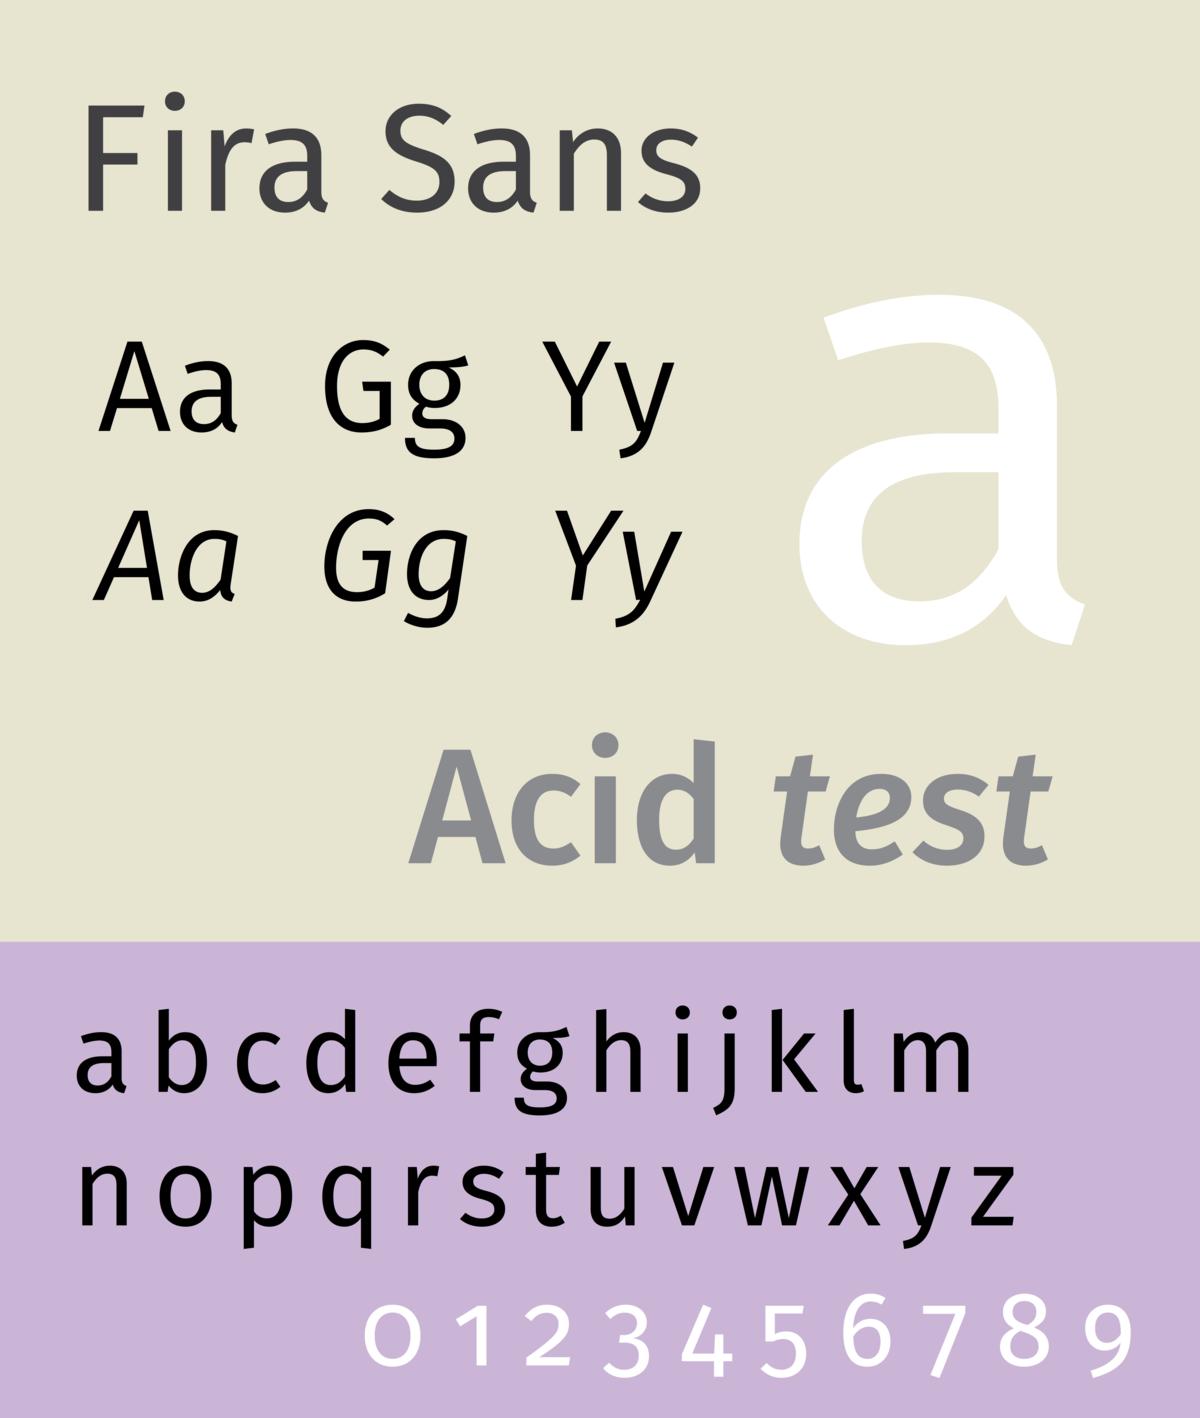 Fira Sans - Wikipedia